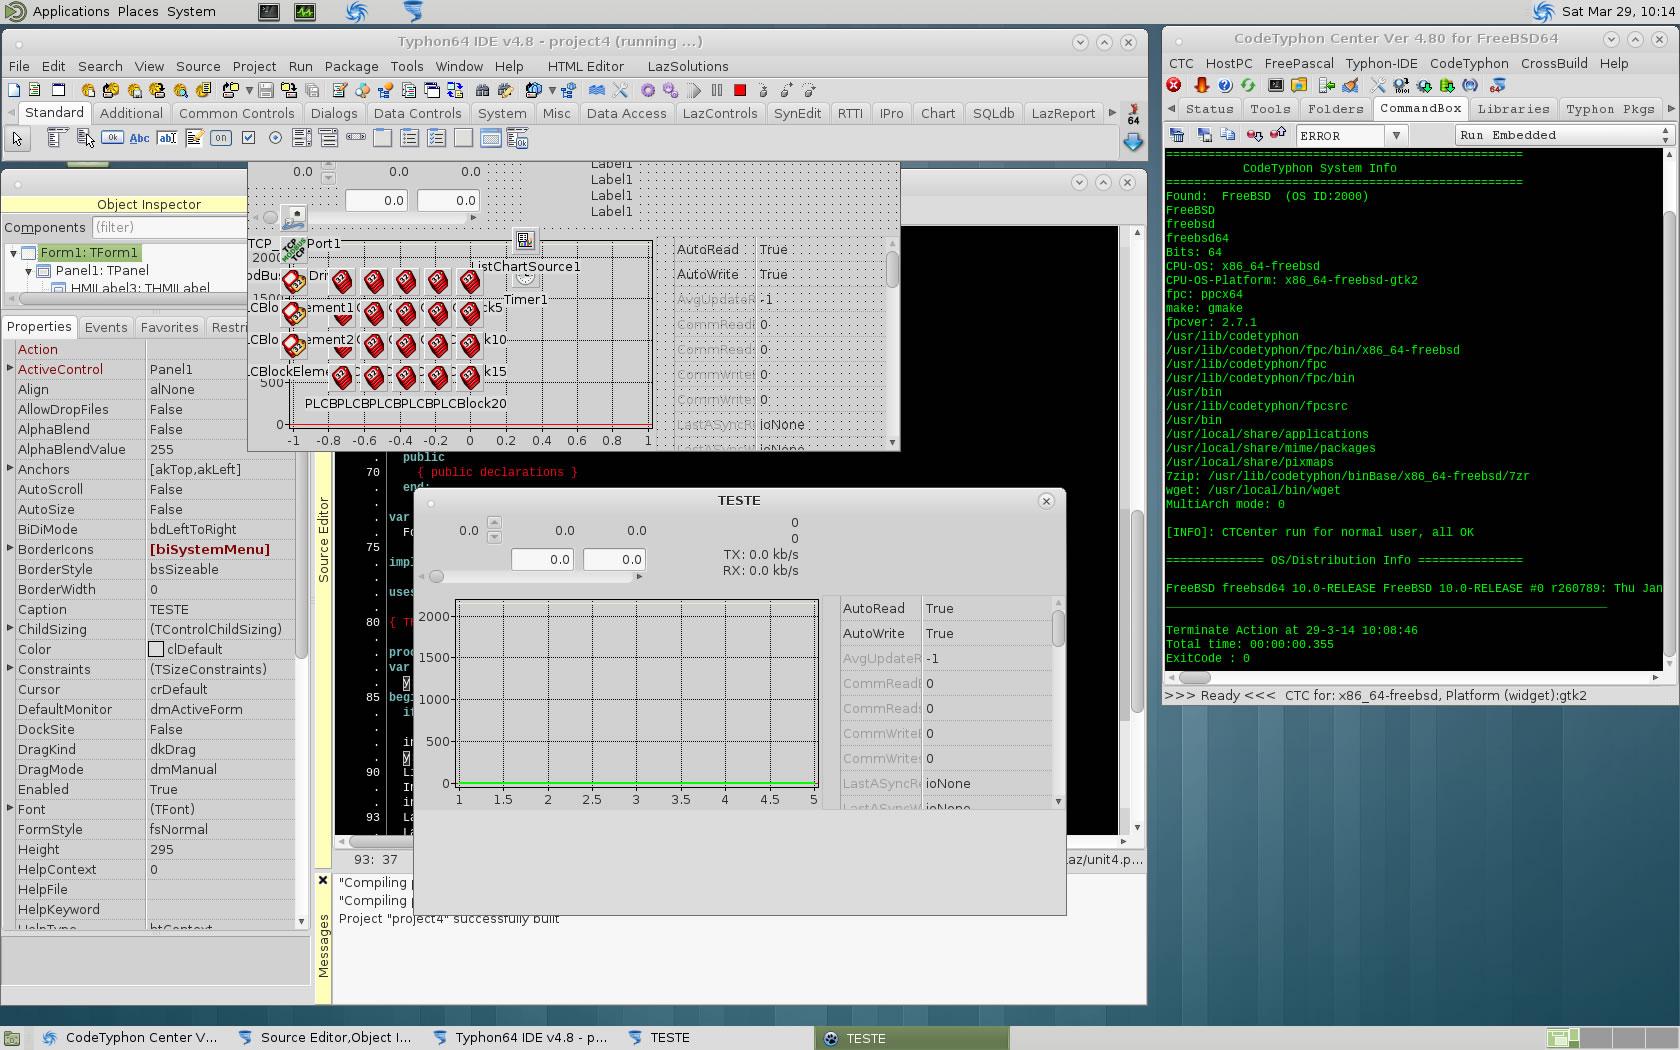 FreeBSD10-64-27.jpg